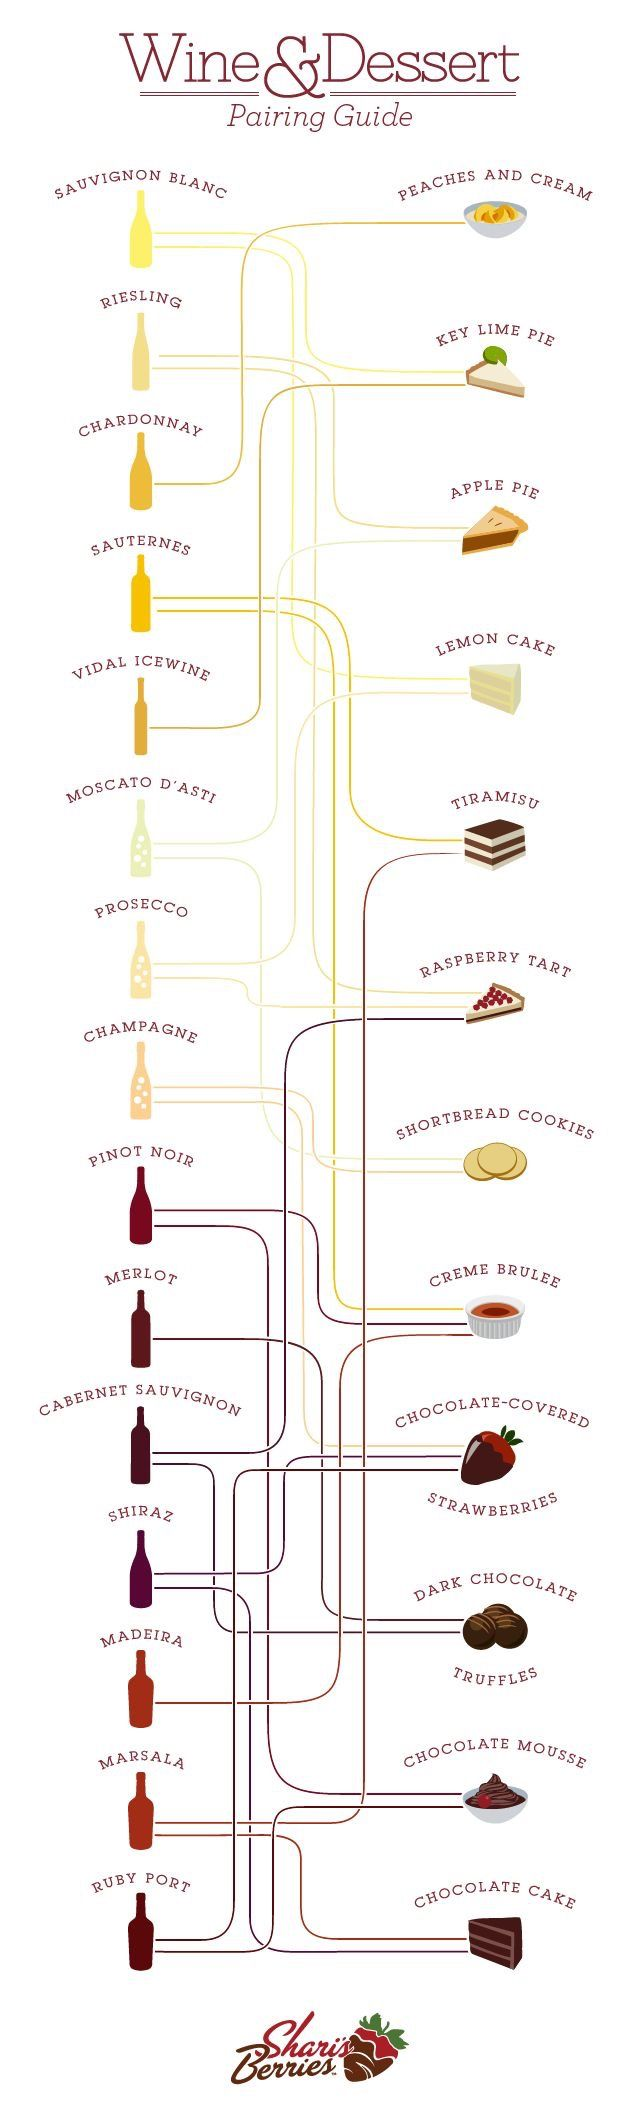 Wine & Dessert Pairing Guide